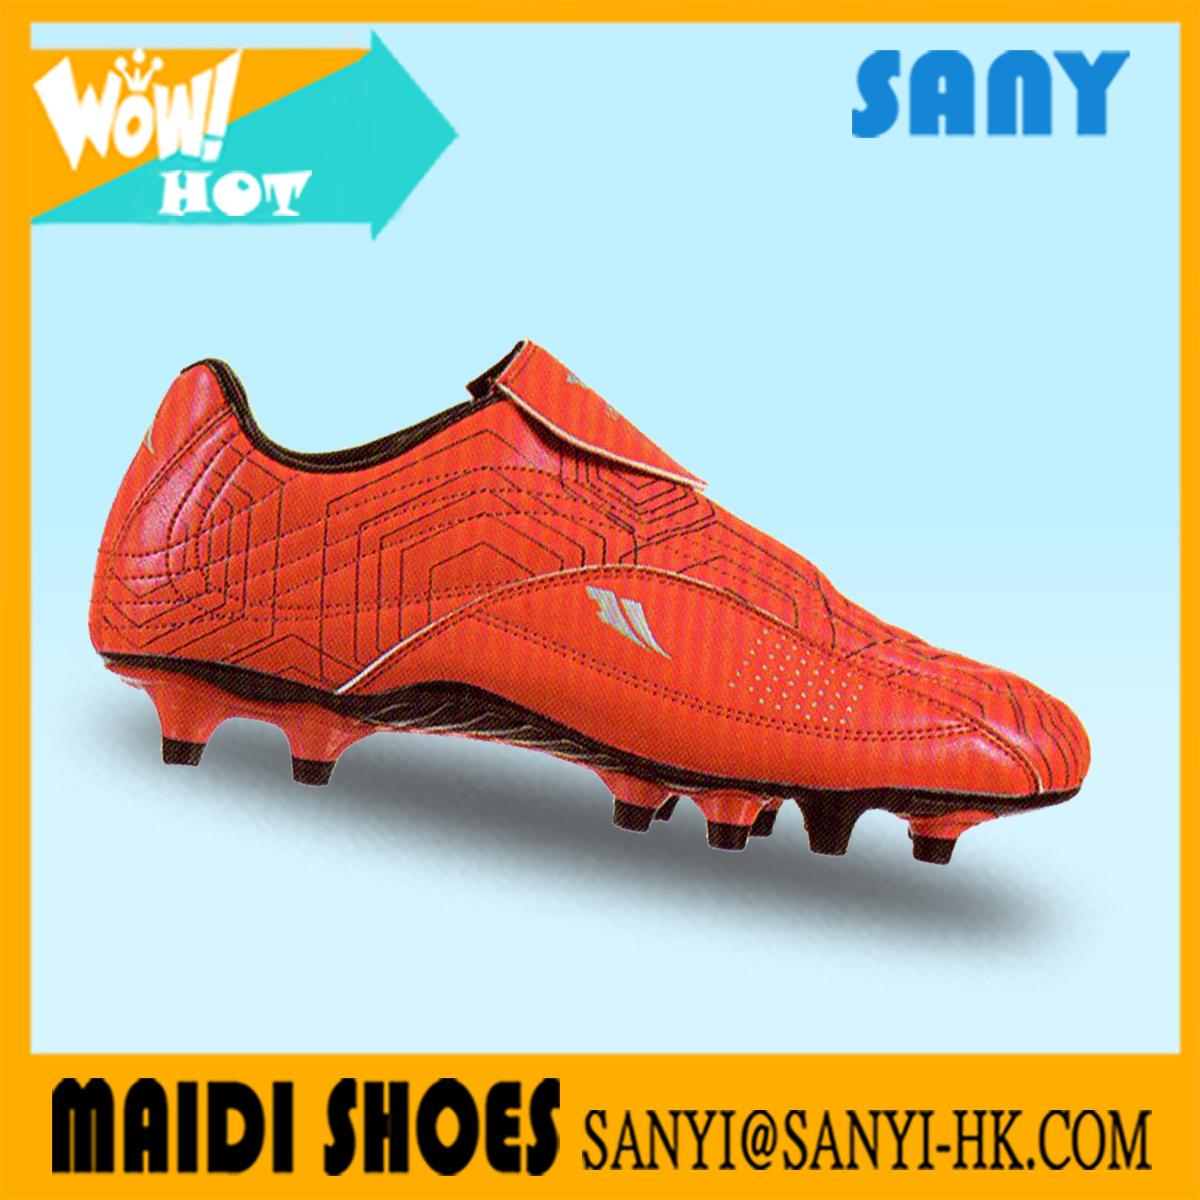 edd1c1149 wholesale soccer shoes Professional design for Men outdoor Turf Hockey Shoe  soccer shoe football shoes sport